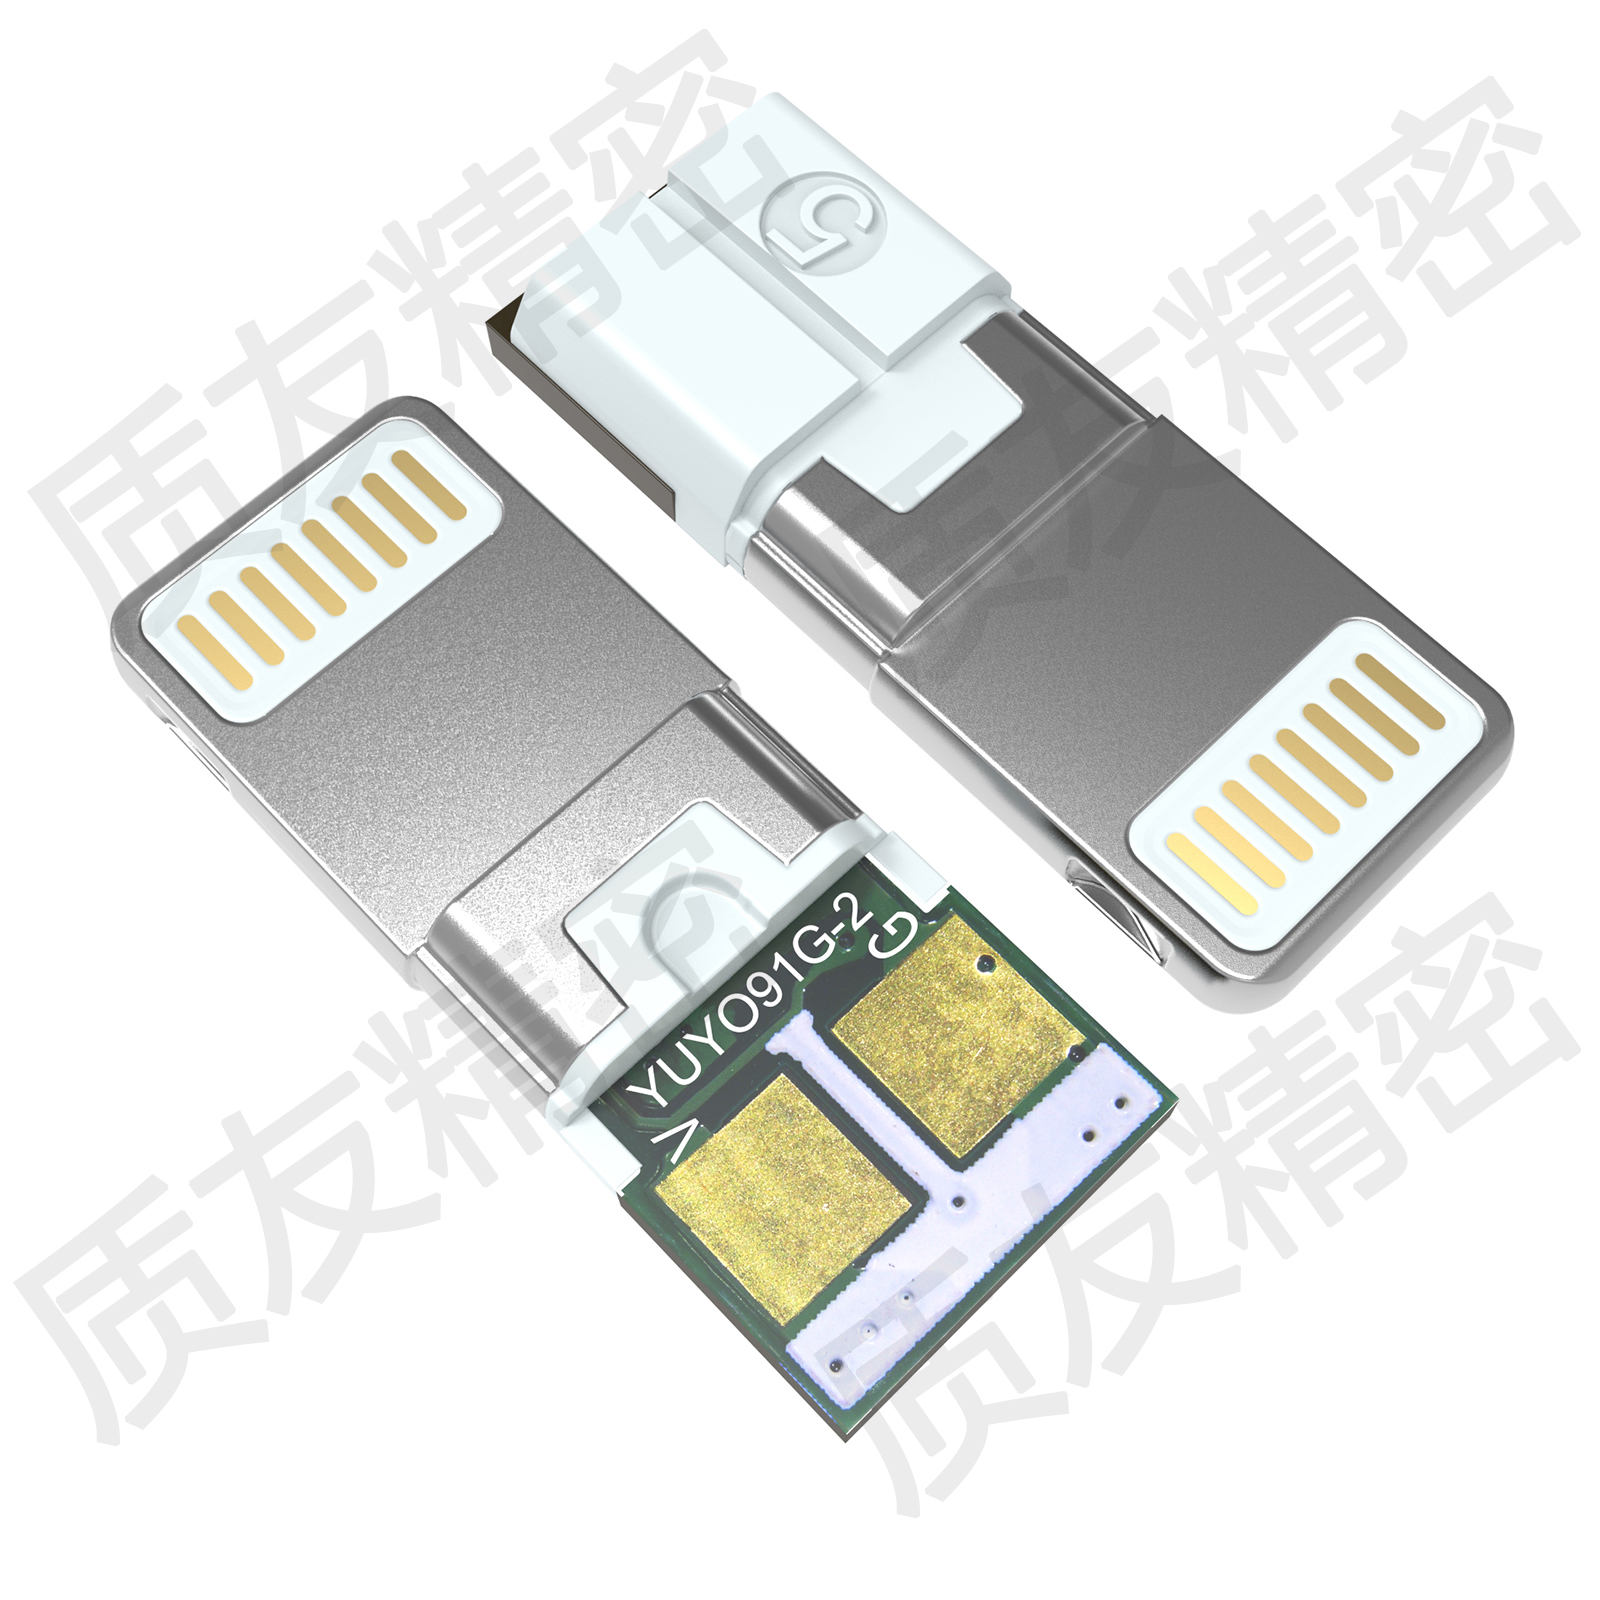 苹果8p一体12W 快充插头YUYO91G-2  2焊点